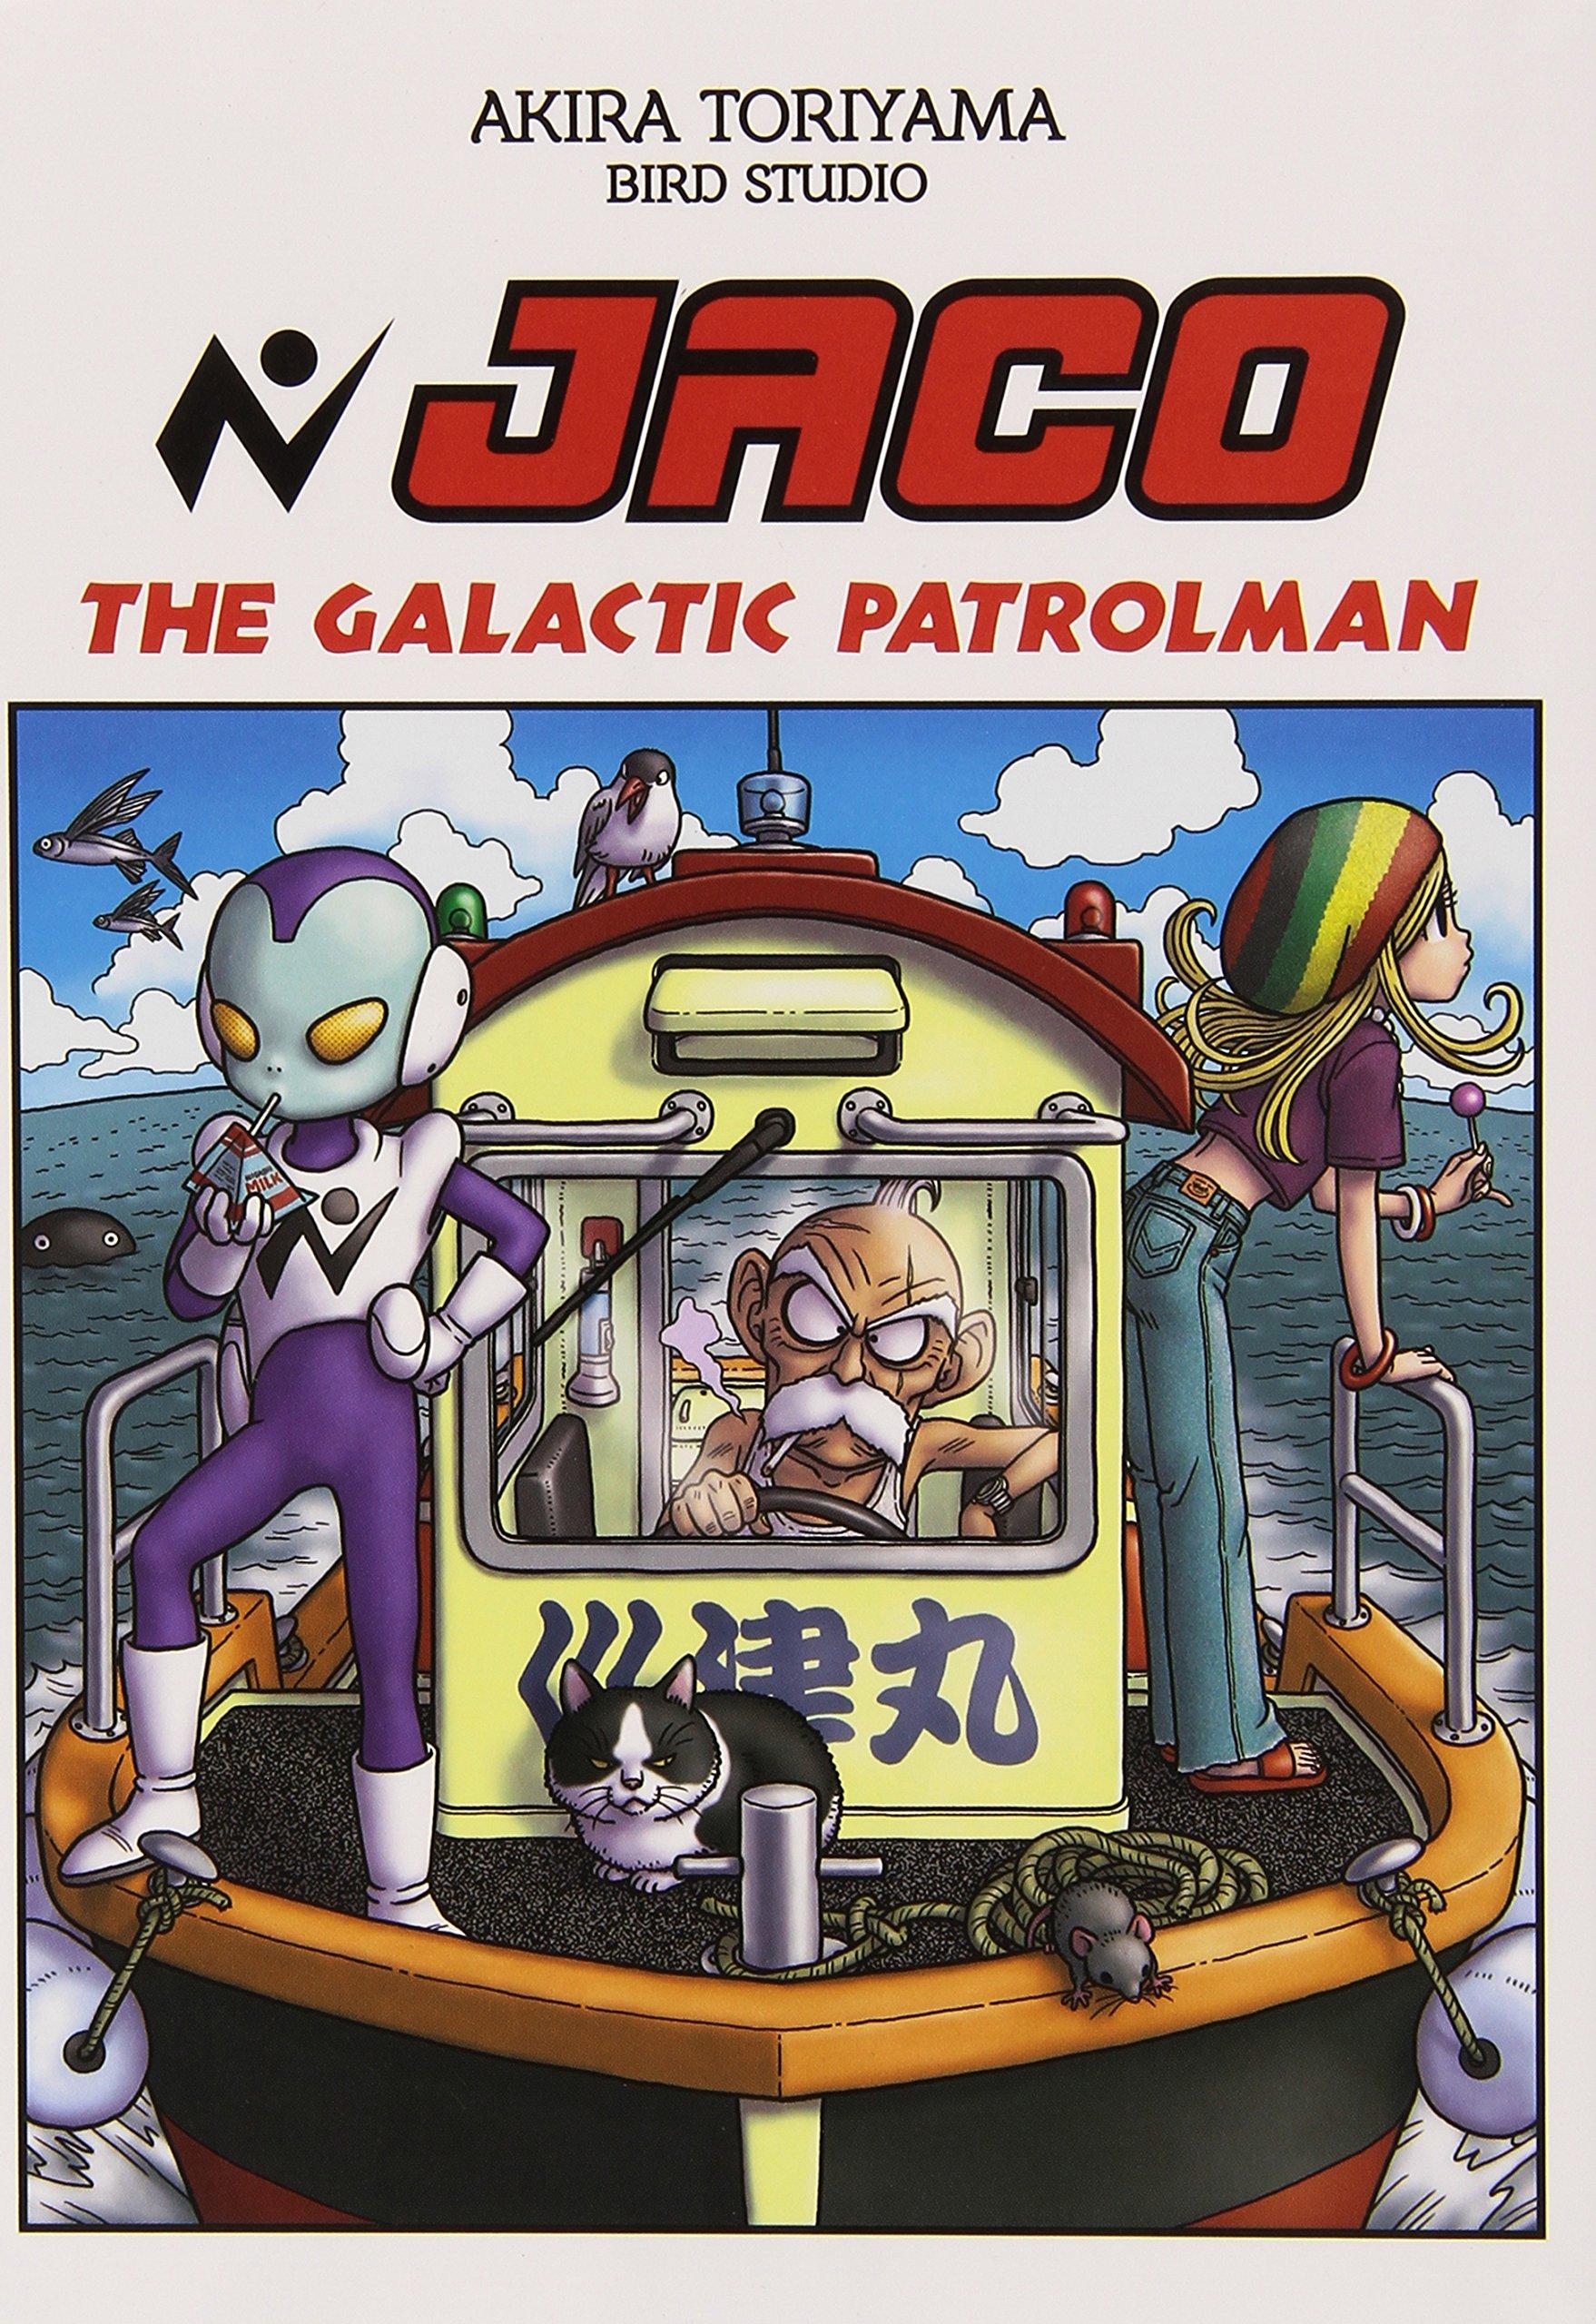 Jaco the galactic patrol man. Con gadget Copertina flessibile – 2 mag 2015 Akira Toriyama Yupa Star Comics 8869201805